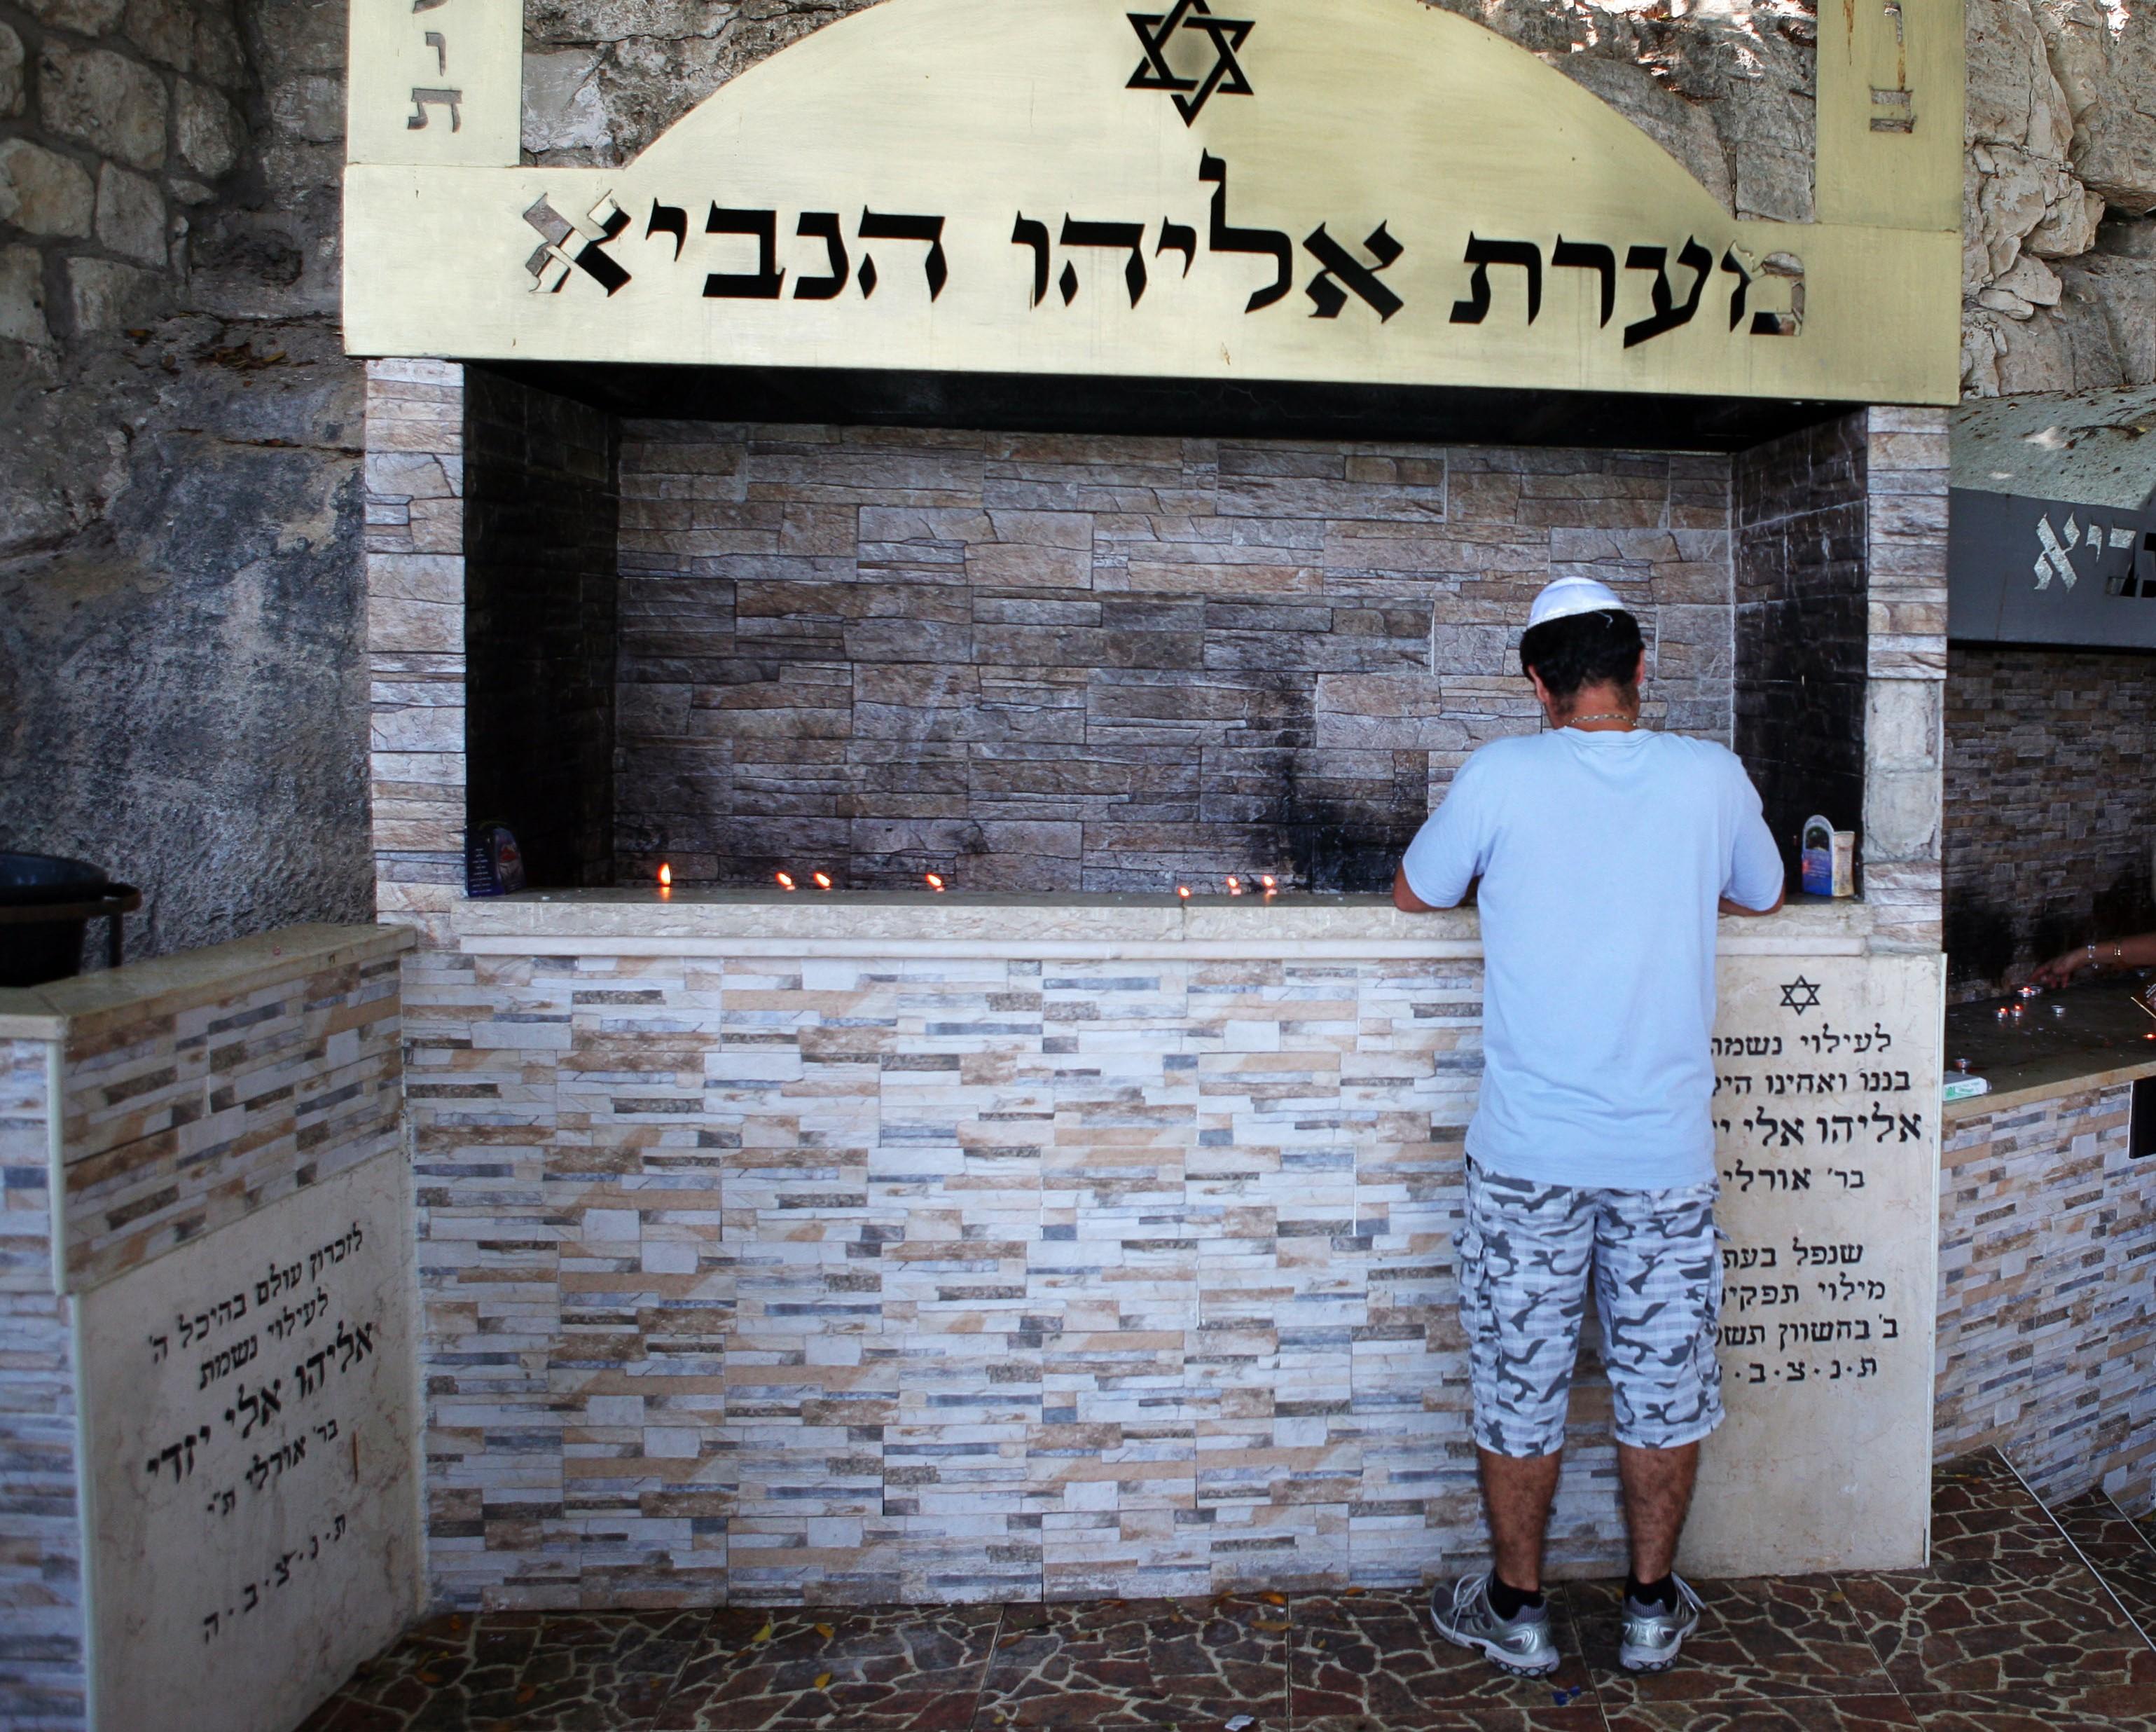 Ultra orthodox pray and light candles in Elijah's (Eliyahu Ha-Navi) cave